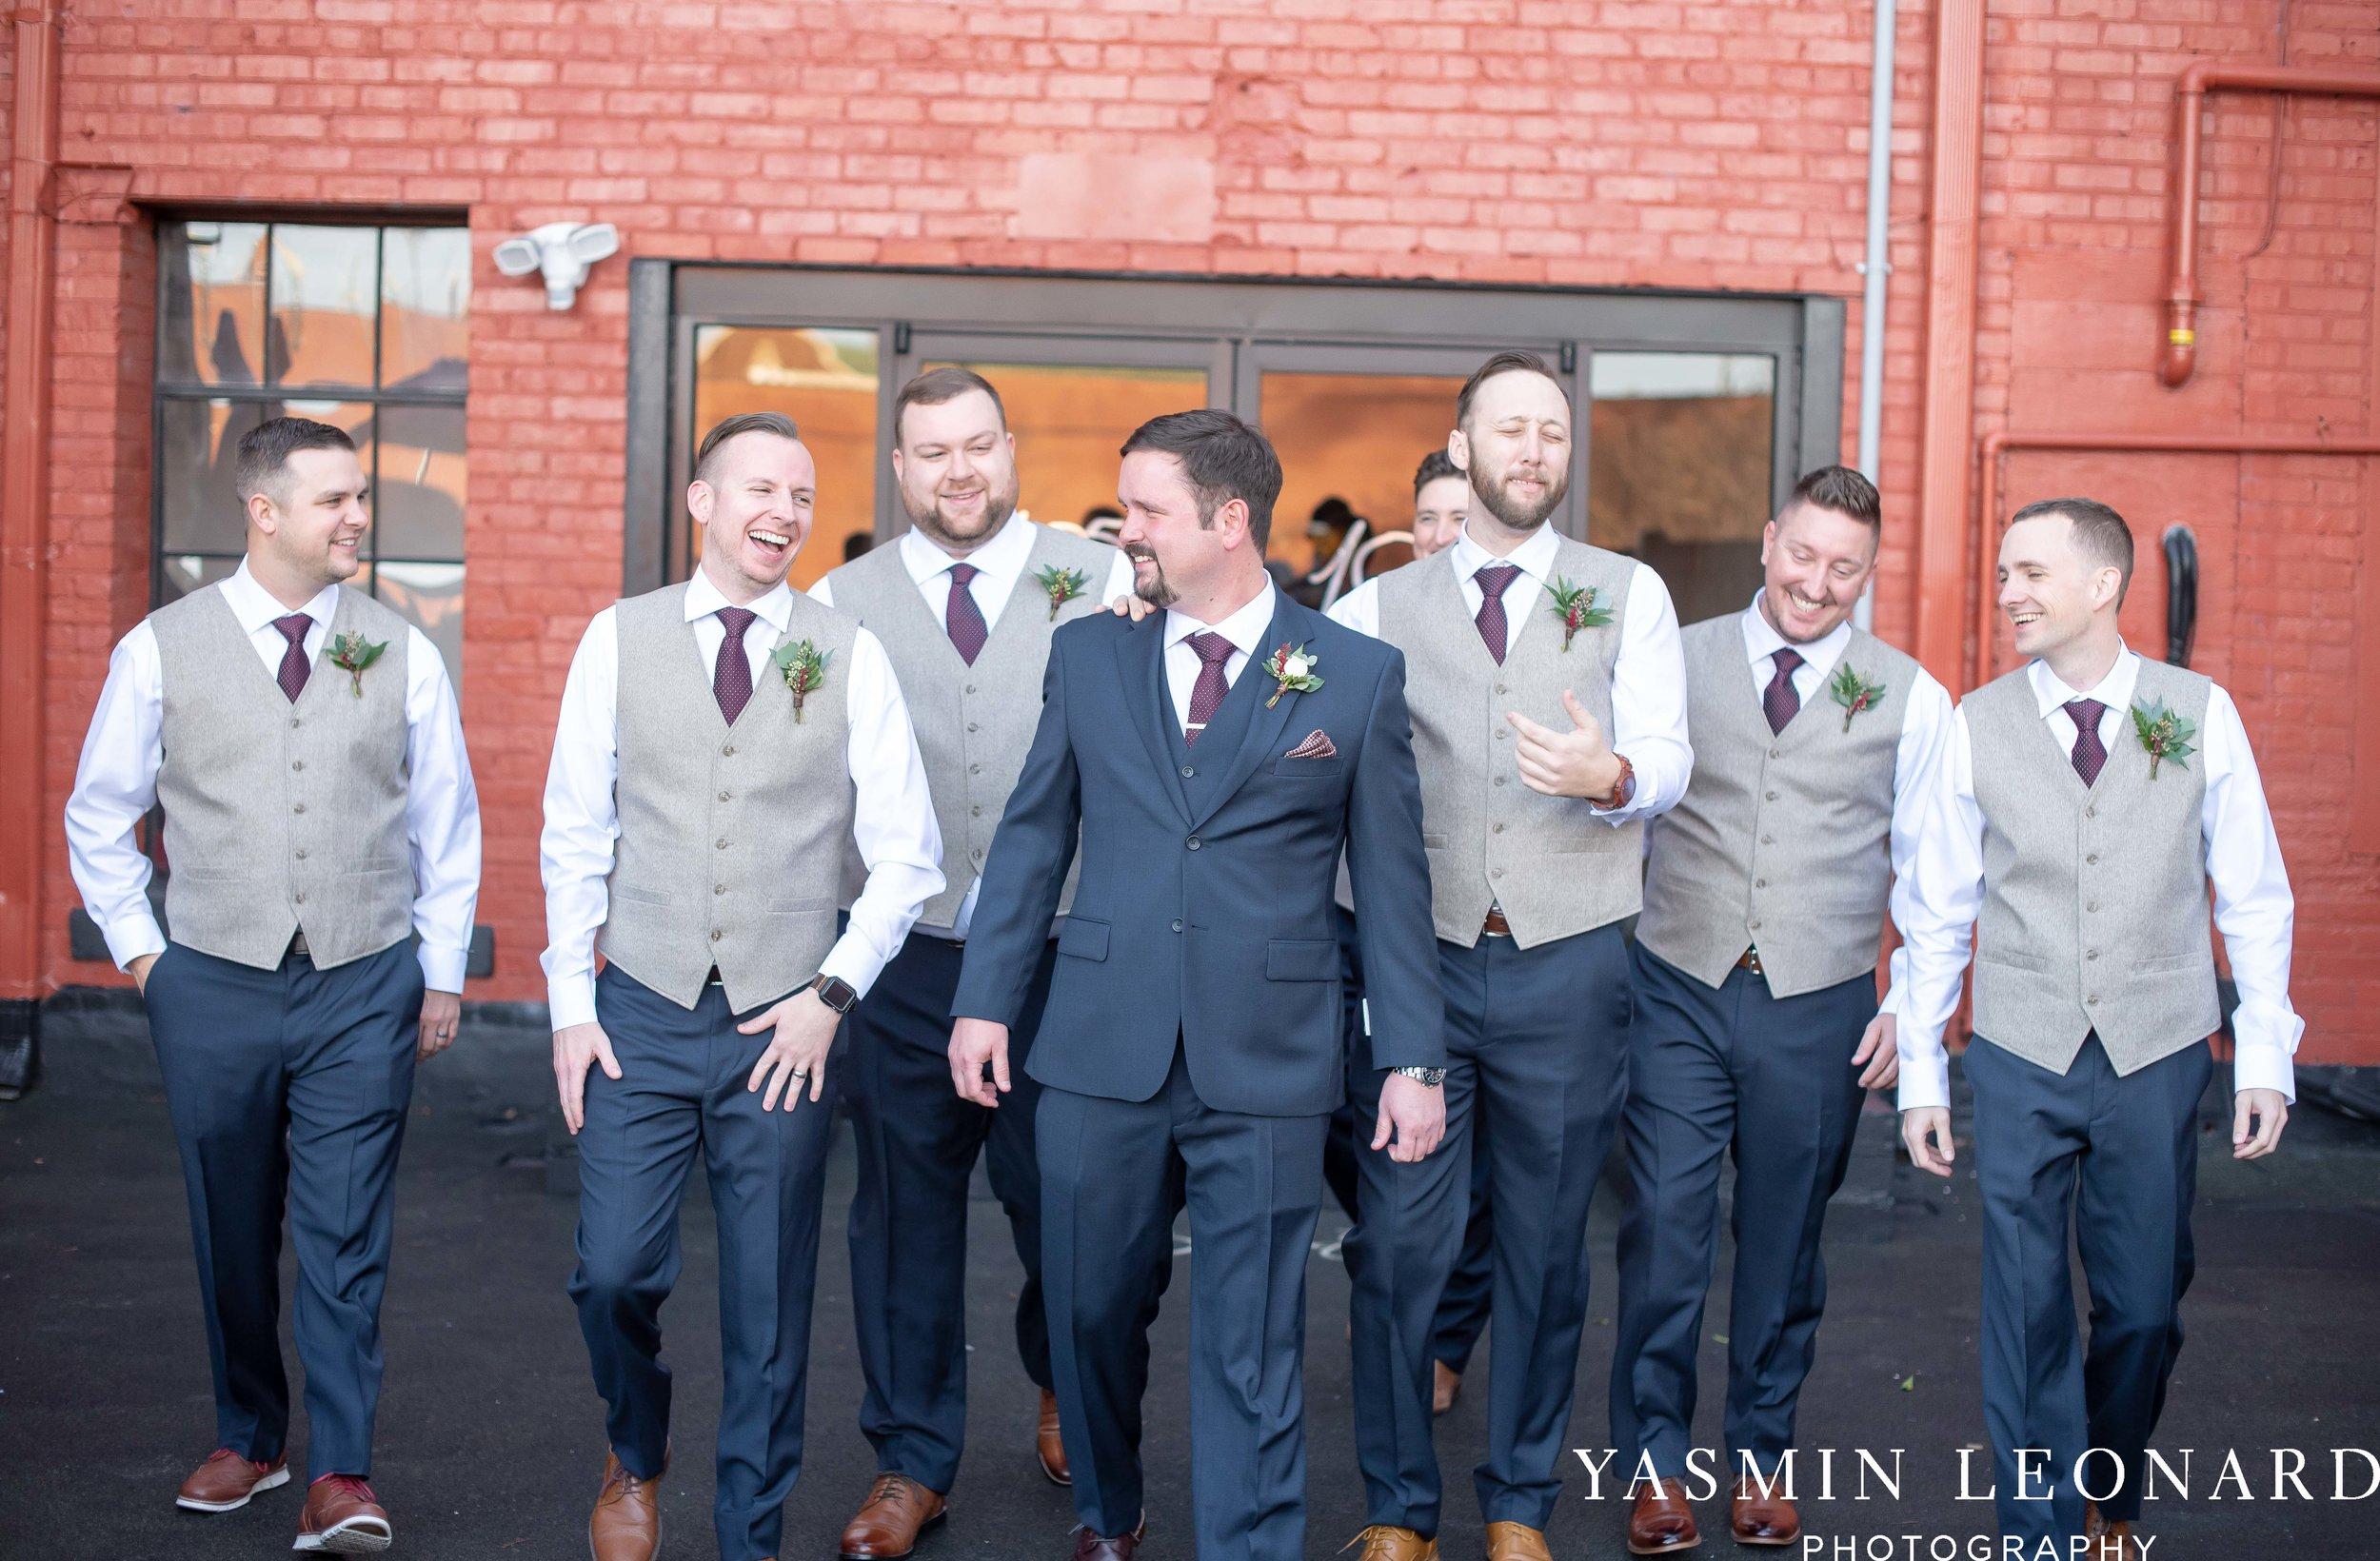 Rebekah and Matt - 105 Worth Event Centre - Yasmin Leonard Photography - Asheboro Wedding - NC Wedding - High Point Weddings - Triad Weddings - Winter Wedding-9.jpg